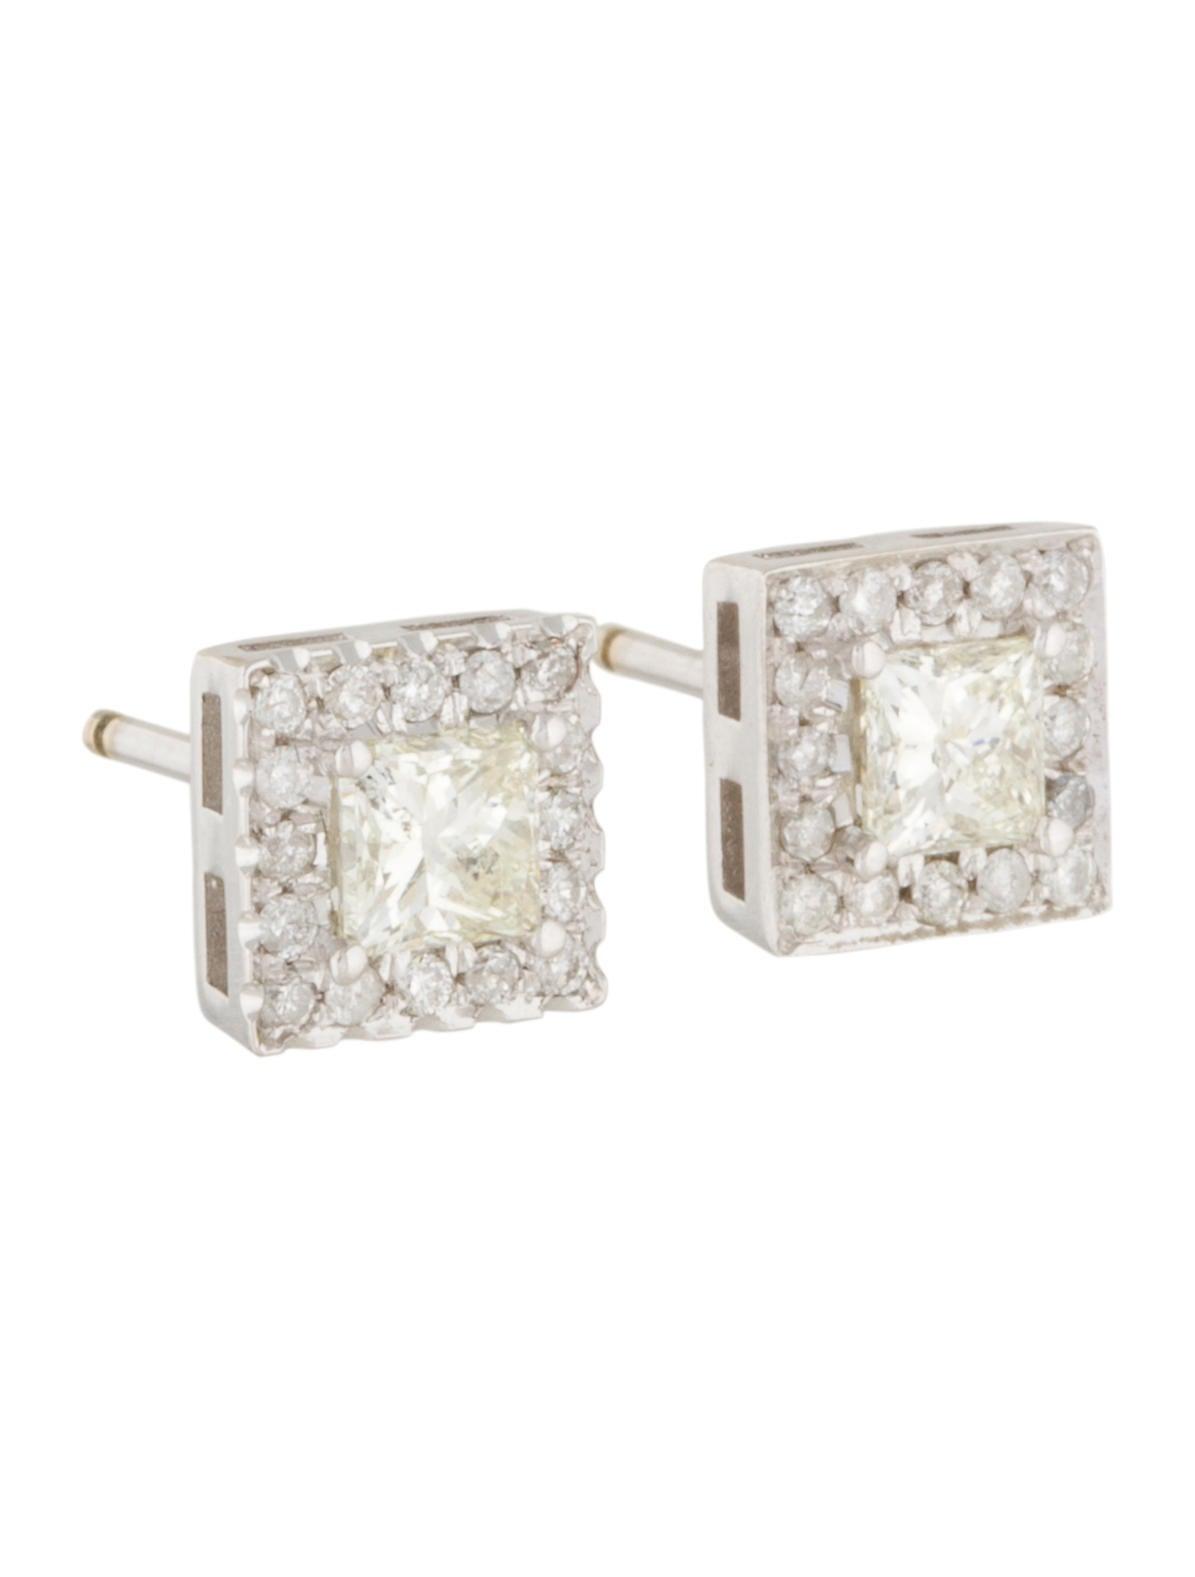 14k princess cut diamond square stud earrings earrings. Black Bedroom Furniture Sets. Home Design Ideas